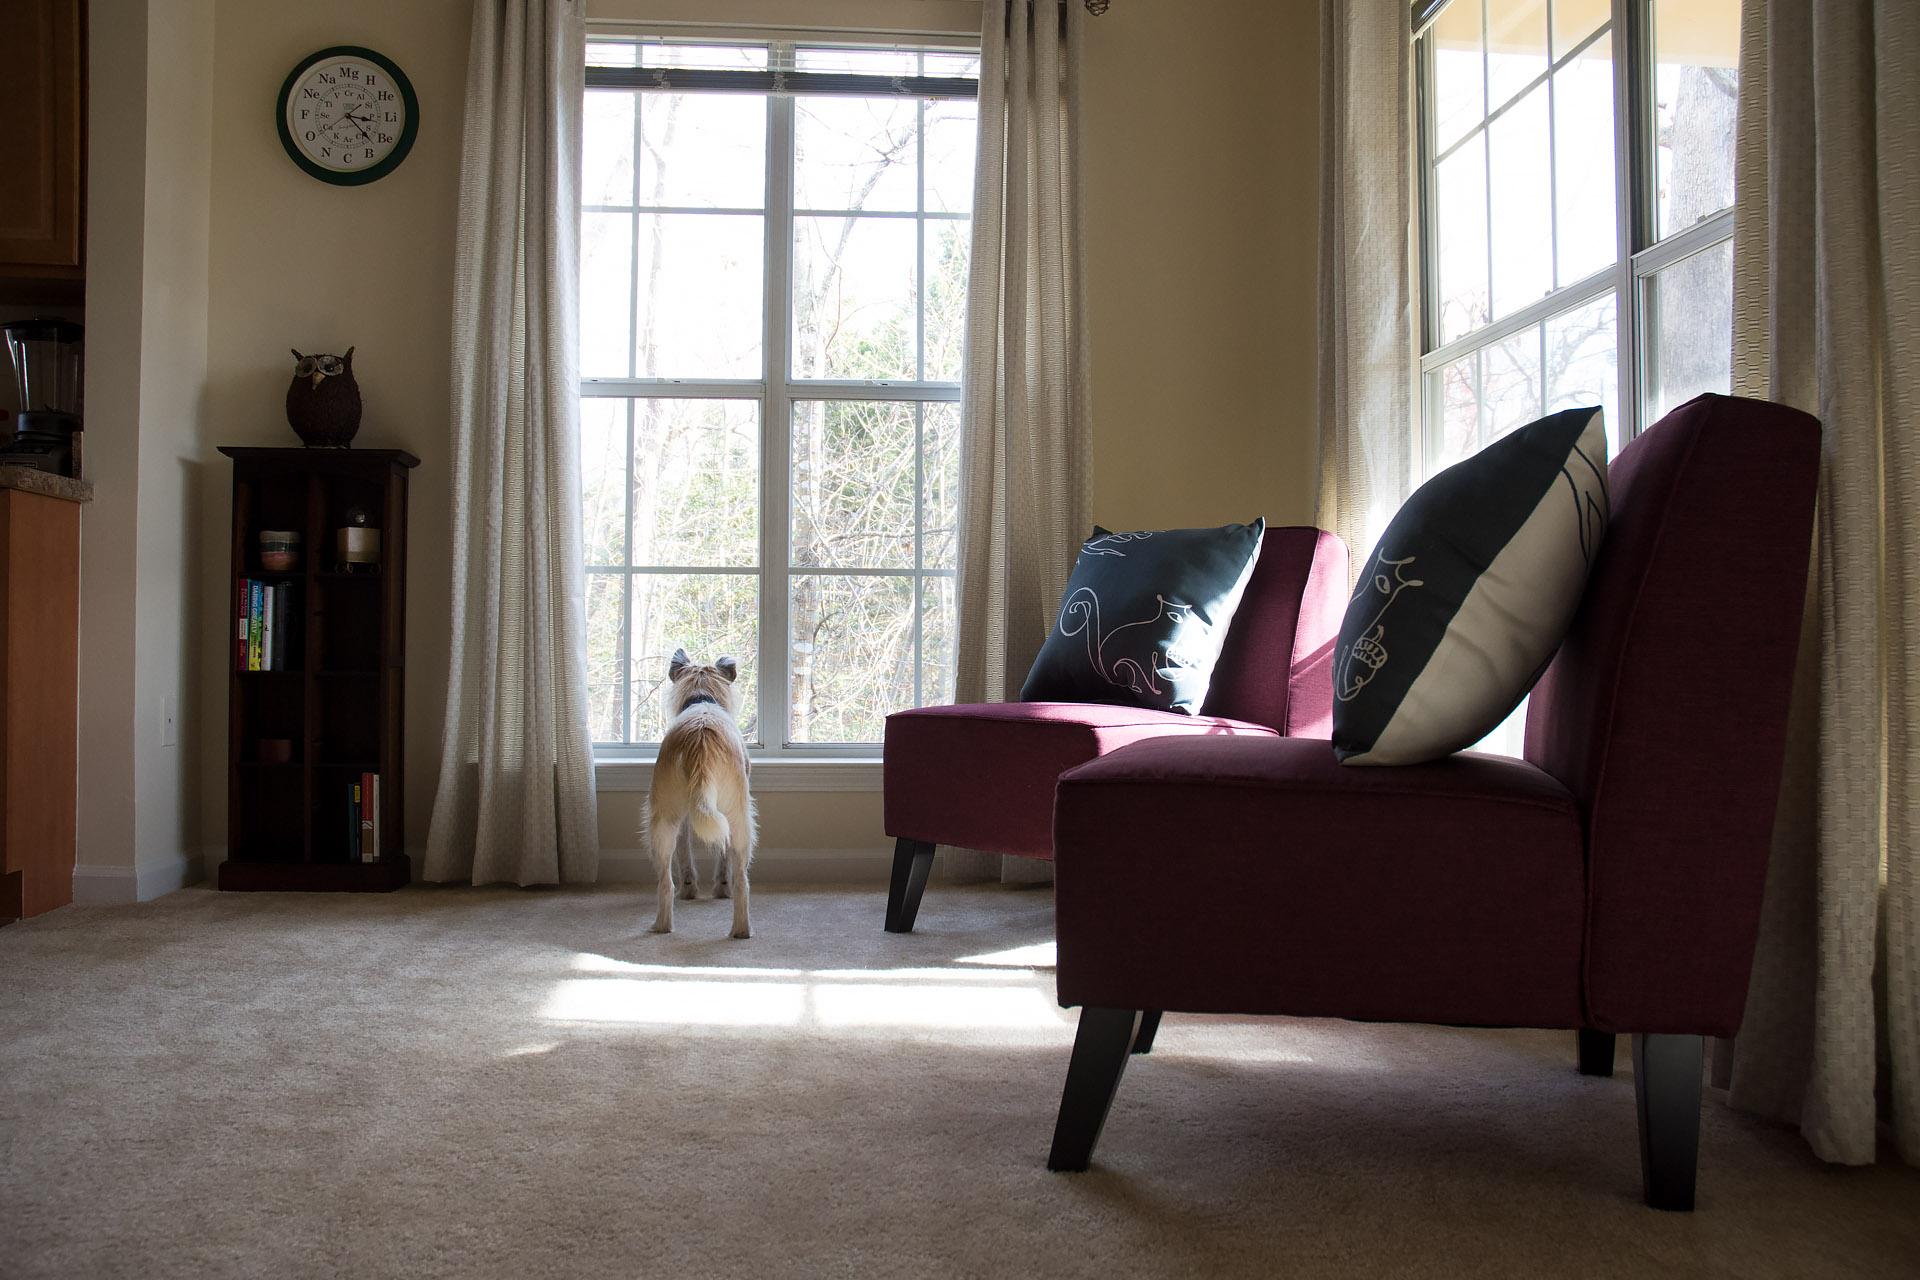 Sanchez' room & 'squirrel-viewing' window